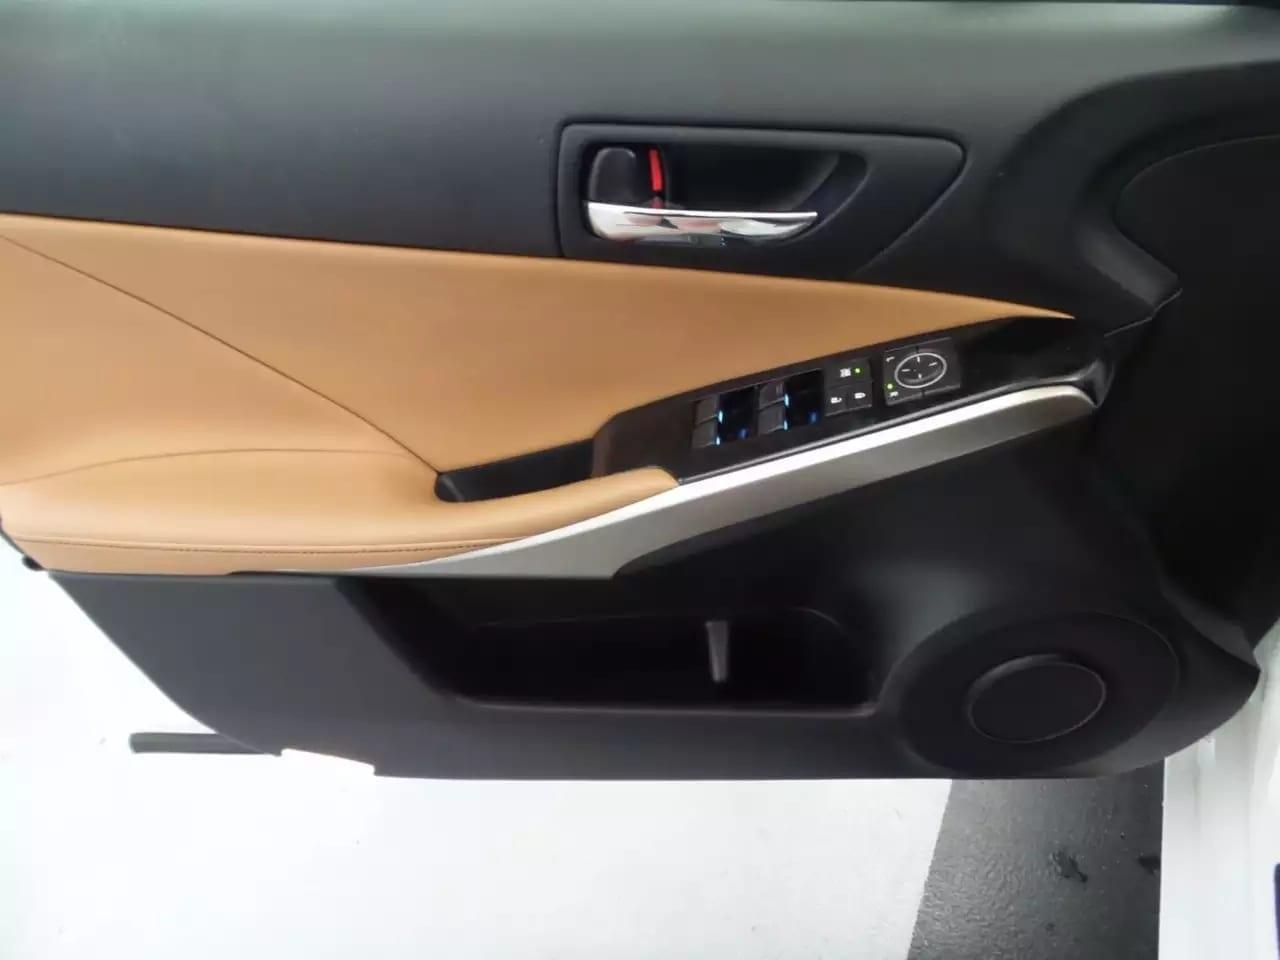 2014 lexus IS250 AWD,lurxury版,白外内棕,导航倒车蓝牙aux拨片全有。里程:31k